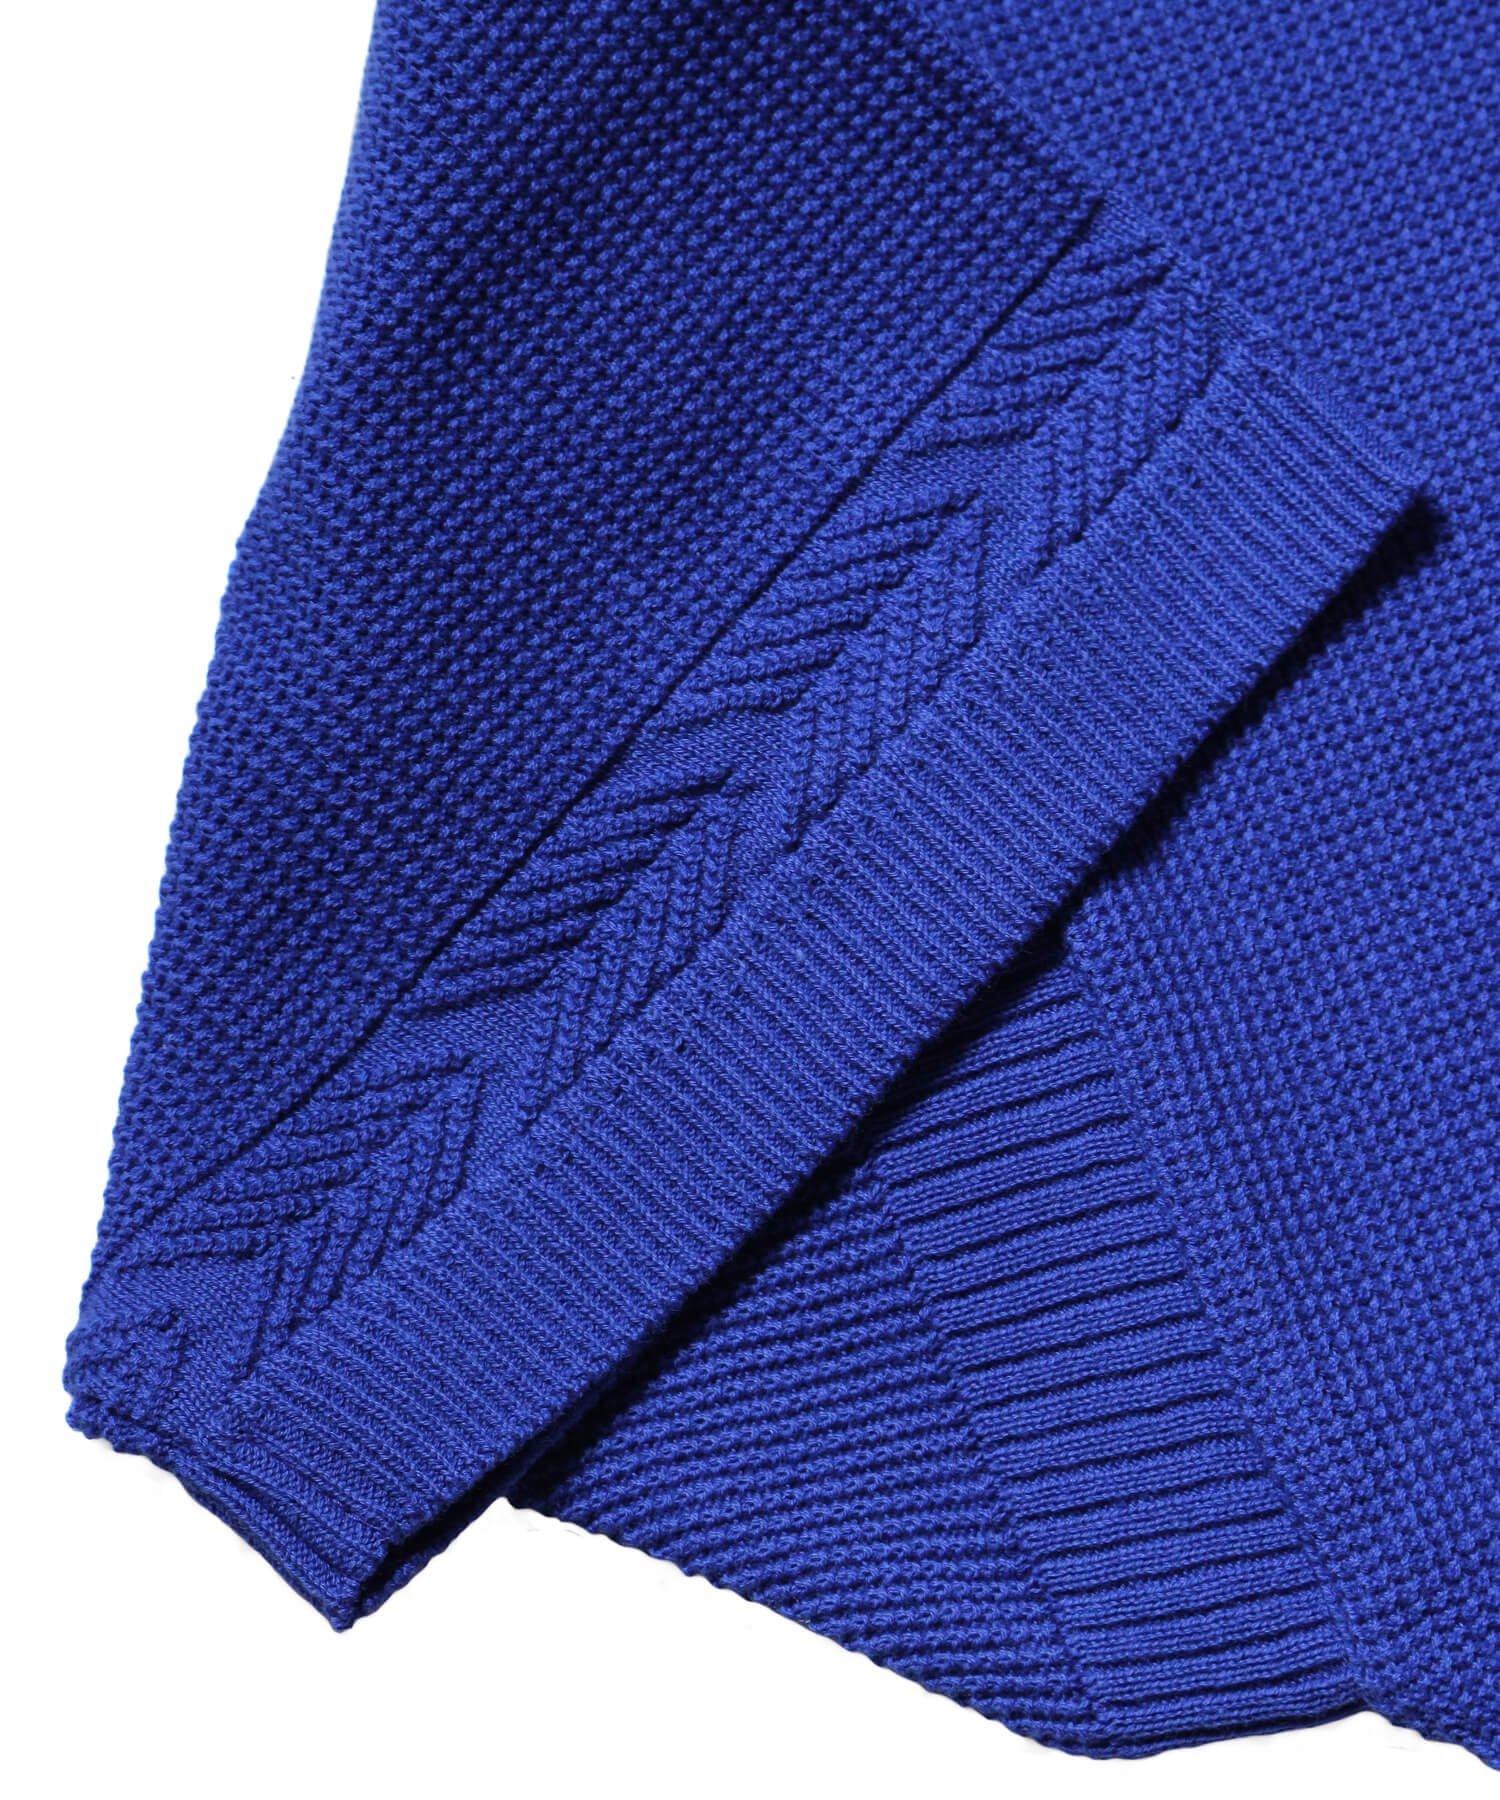 YASHIKI / ヤシキ |YASHIKI / ヤシキ × SIDEMILITIA inc. / サイドミリティア  RYUREI KNIT (LIMITED BLUE/WOMEN'S) 商品画像6